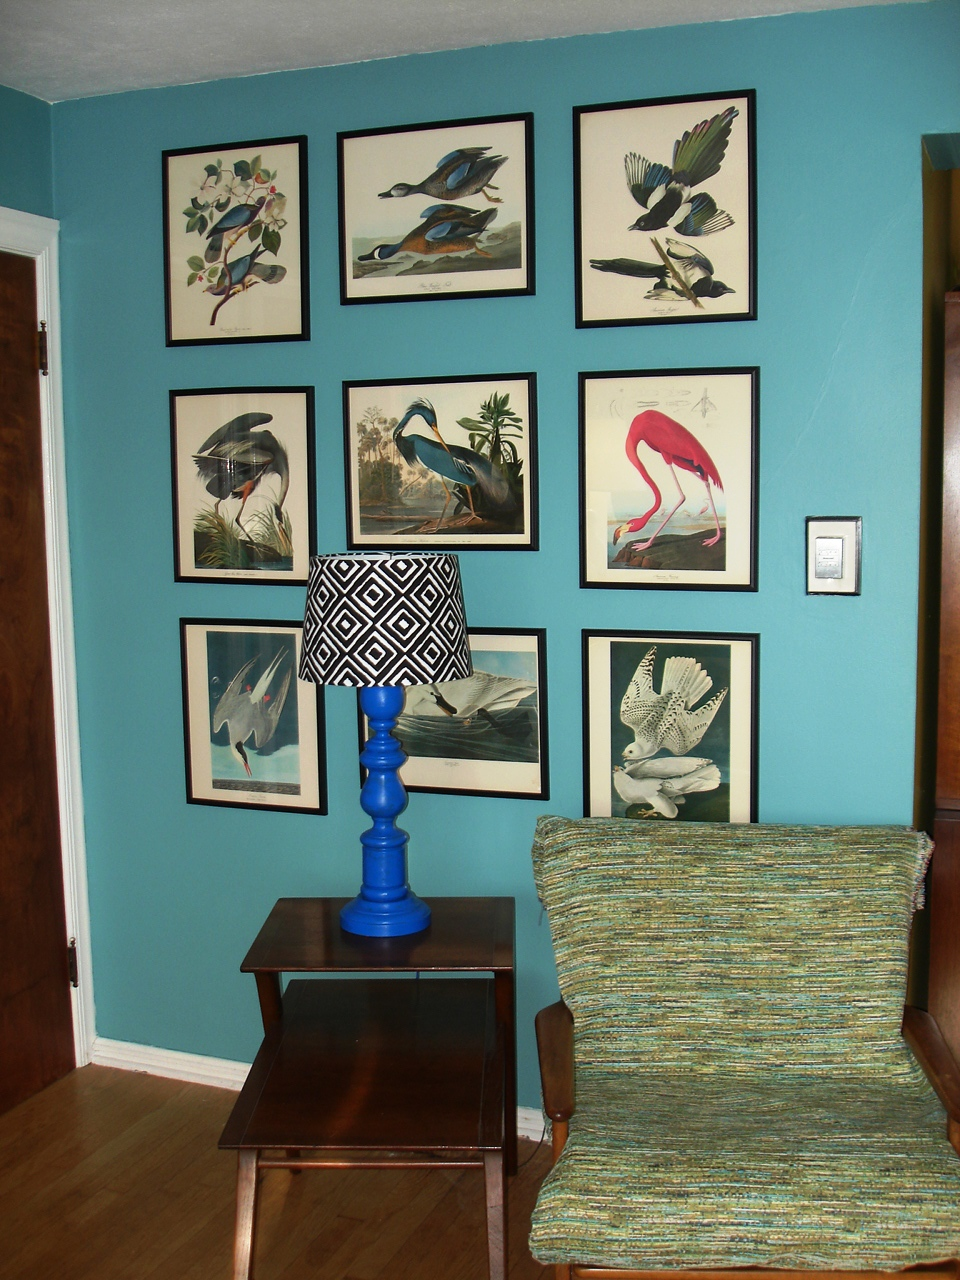 Black Kat's Design: Updates to the Living Room